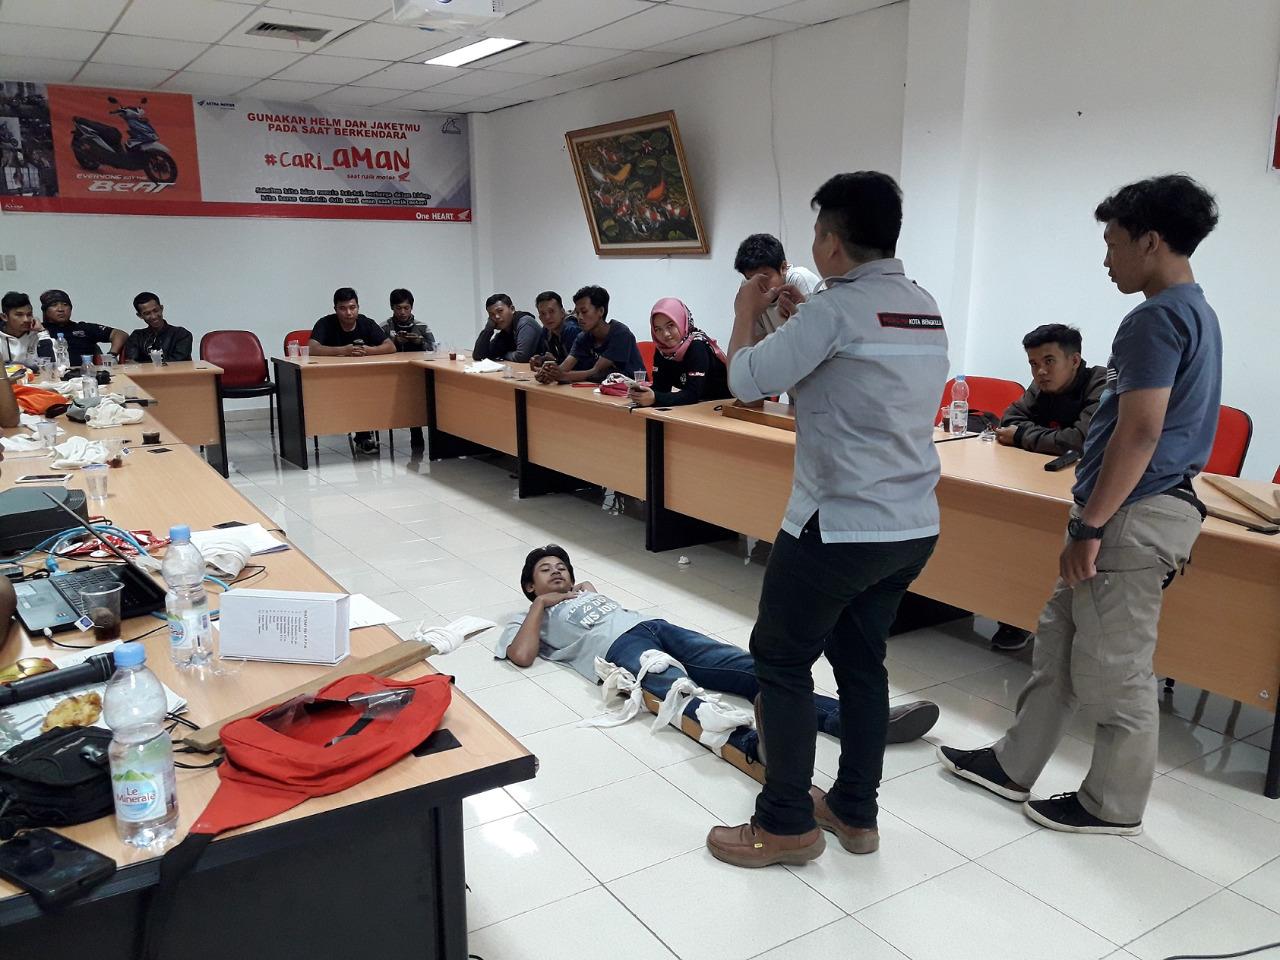 Jelang Satu Dekade HBD 2018, AHM Berikan Pelatihan Keselamatan Untuk Bikers Indonesia.